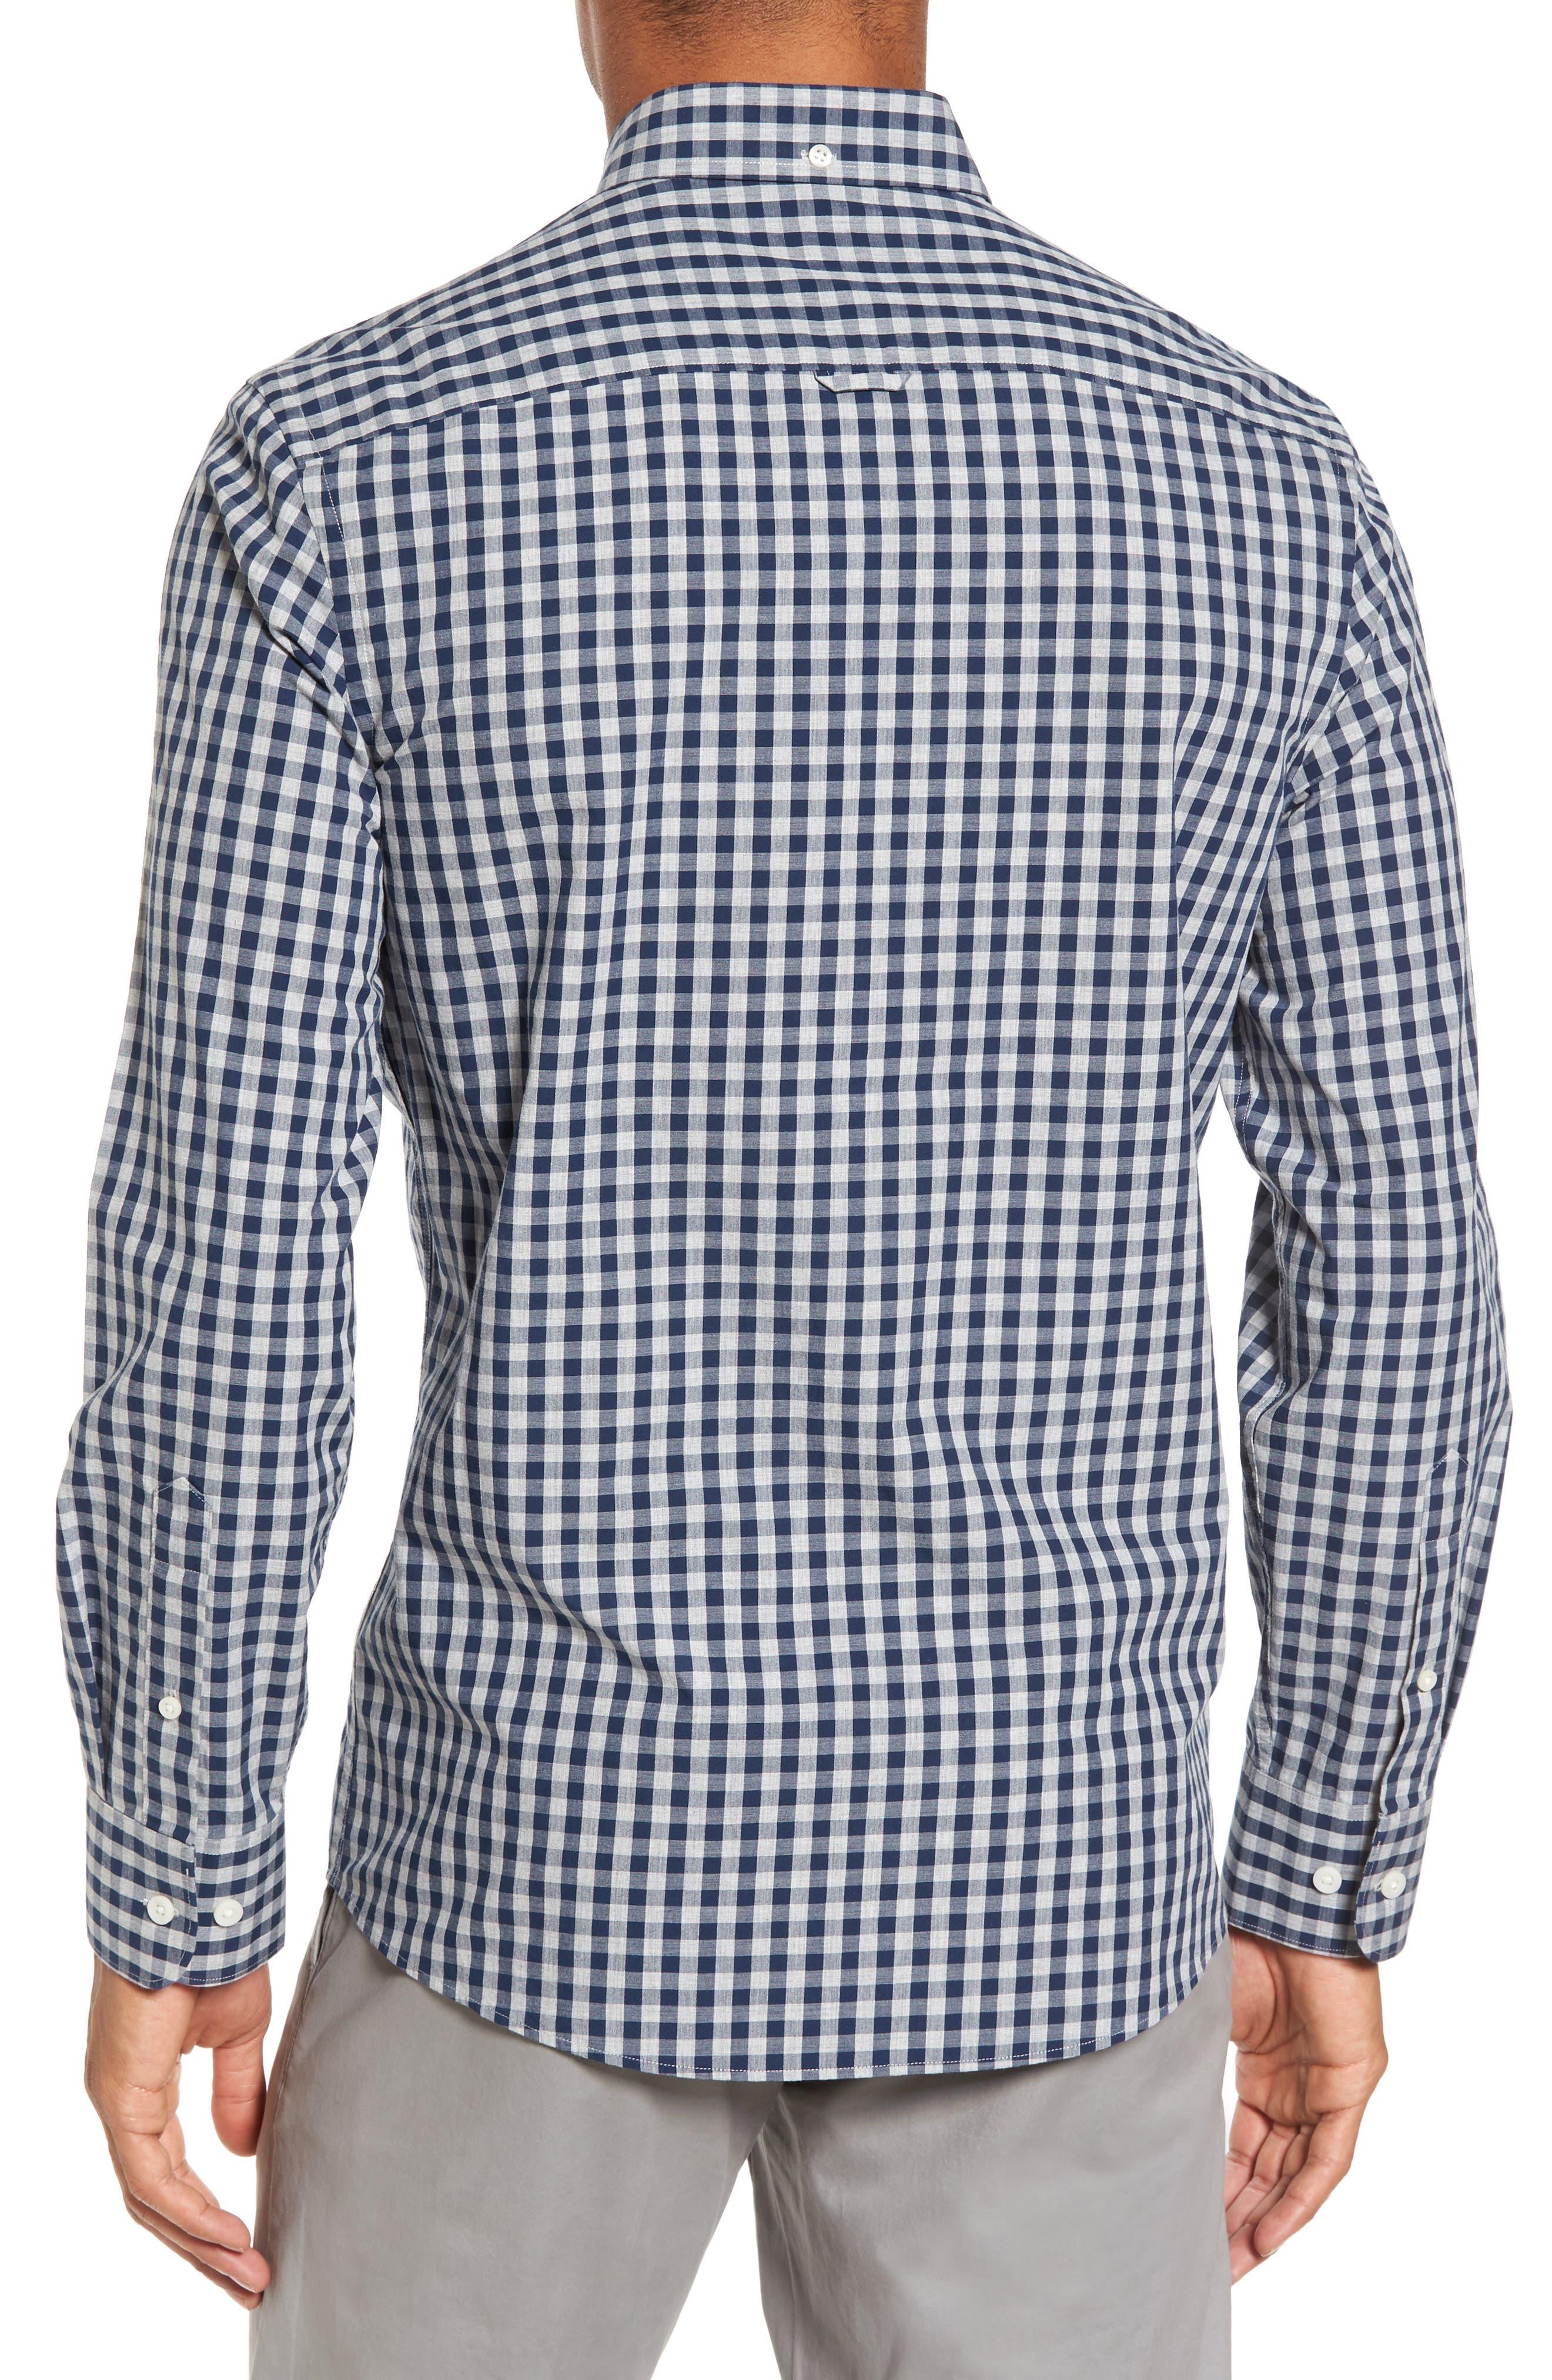 Spade Trim Fit Gingham Check Sport Shirt,                             Alternate thumbnail 2, color,                             030